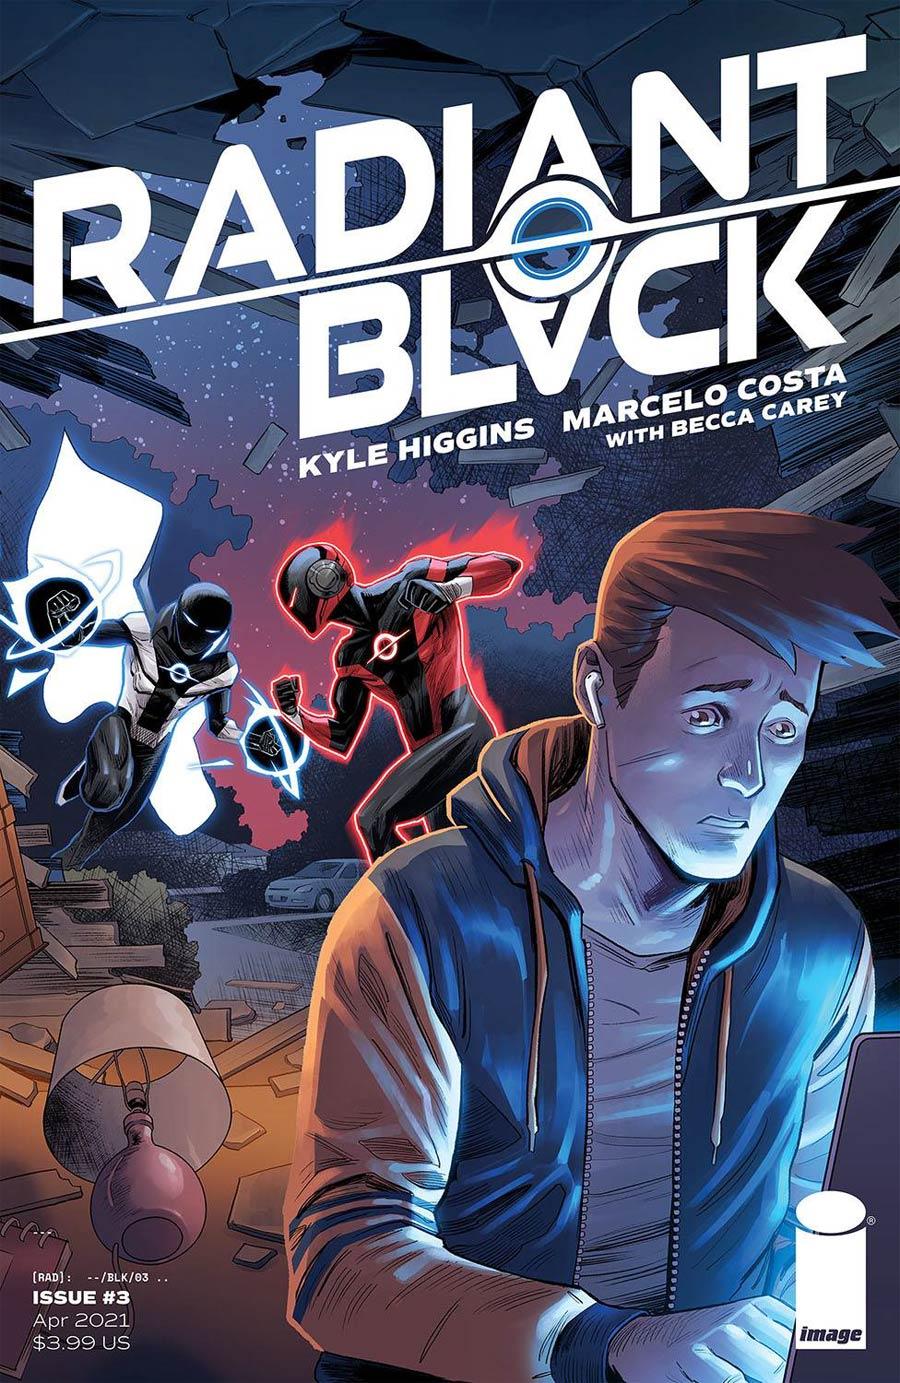 Radiant Black #3 Cover A Regular Marcelo Costa Cover